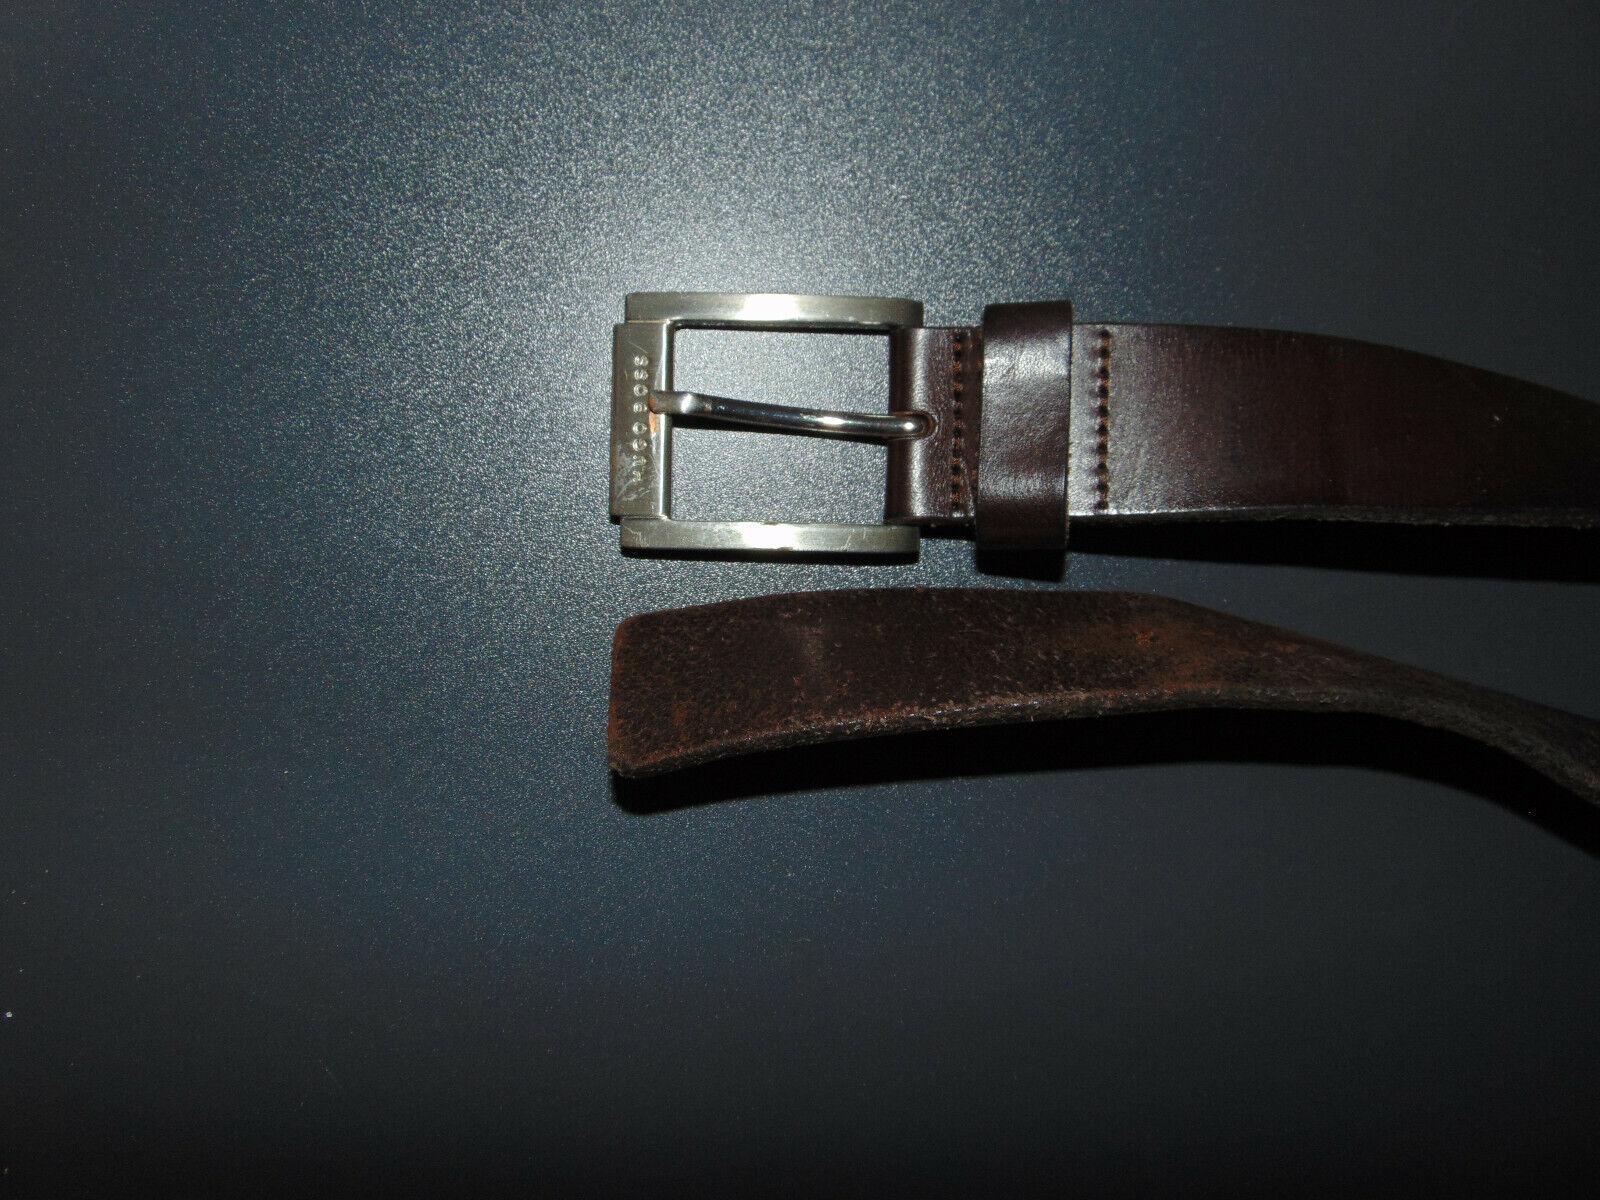 Hugo Boss Gürtel Ledergürtel braun Gr: 90